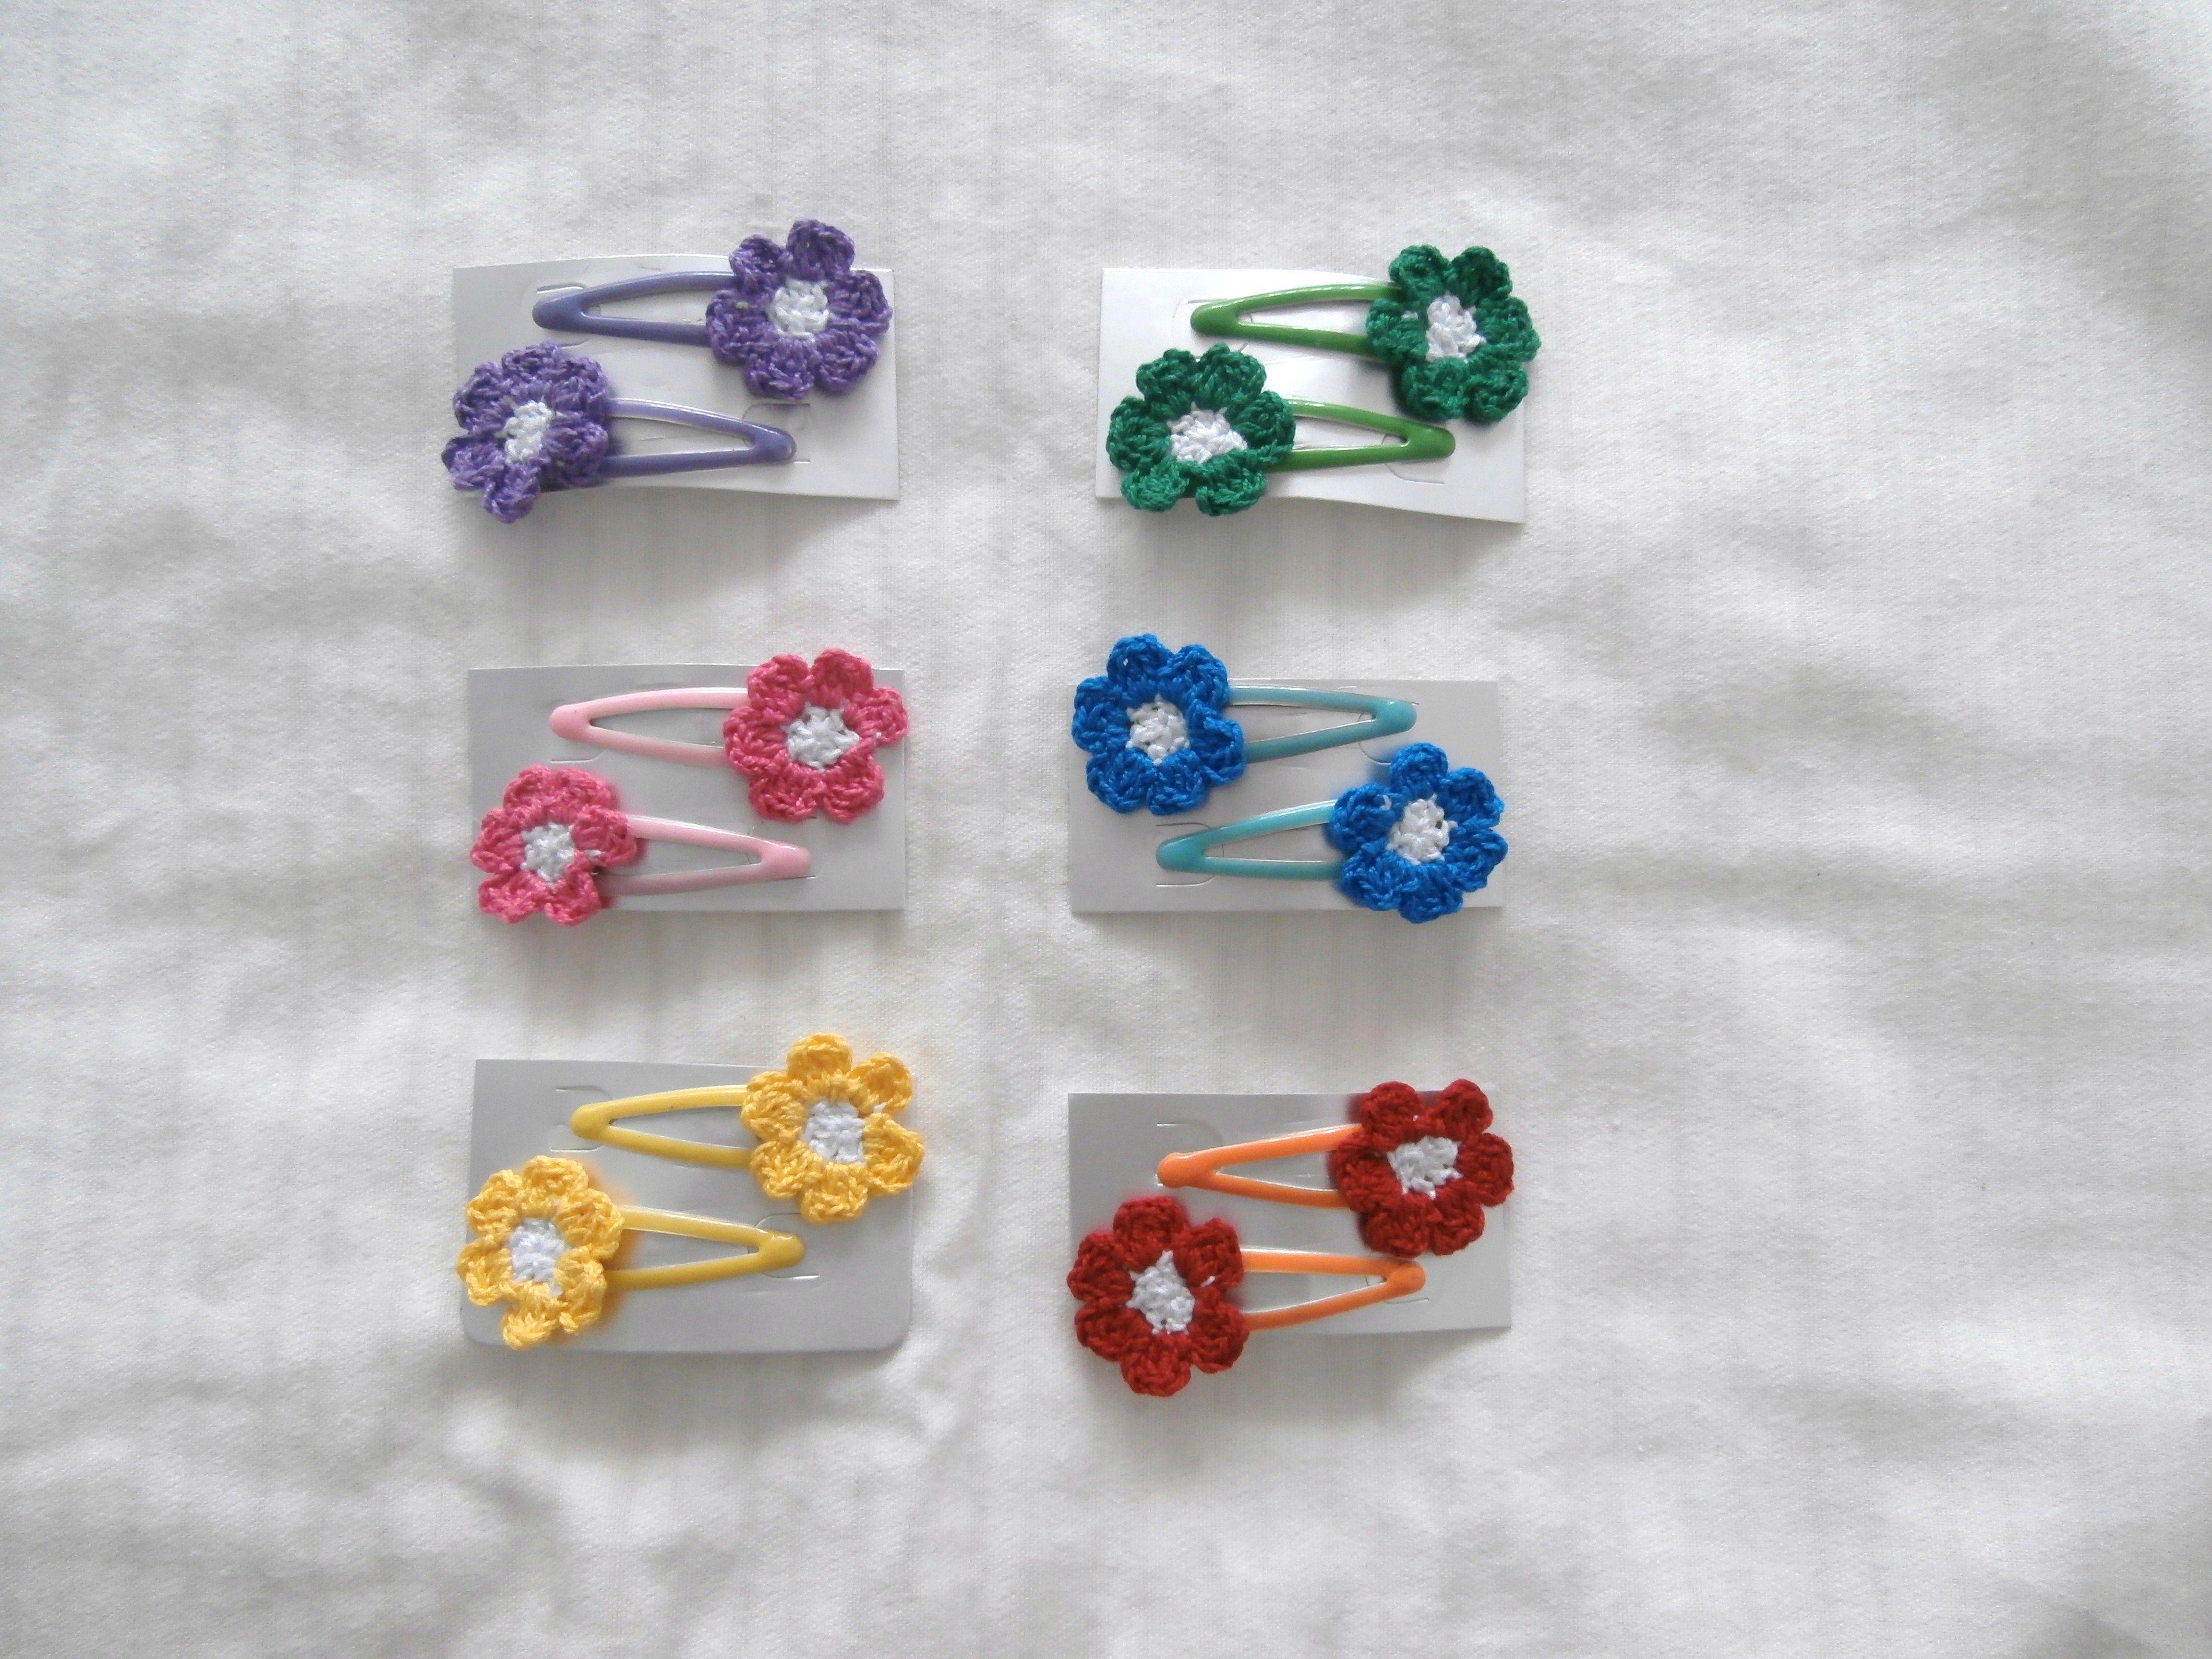 florecitas a crochet para ranitas del pelo | complementos de pelo ...